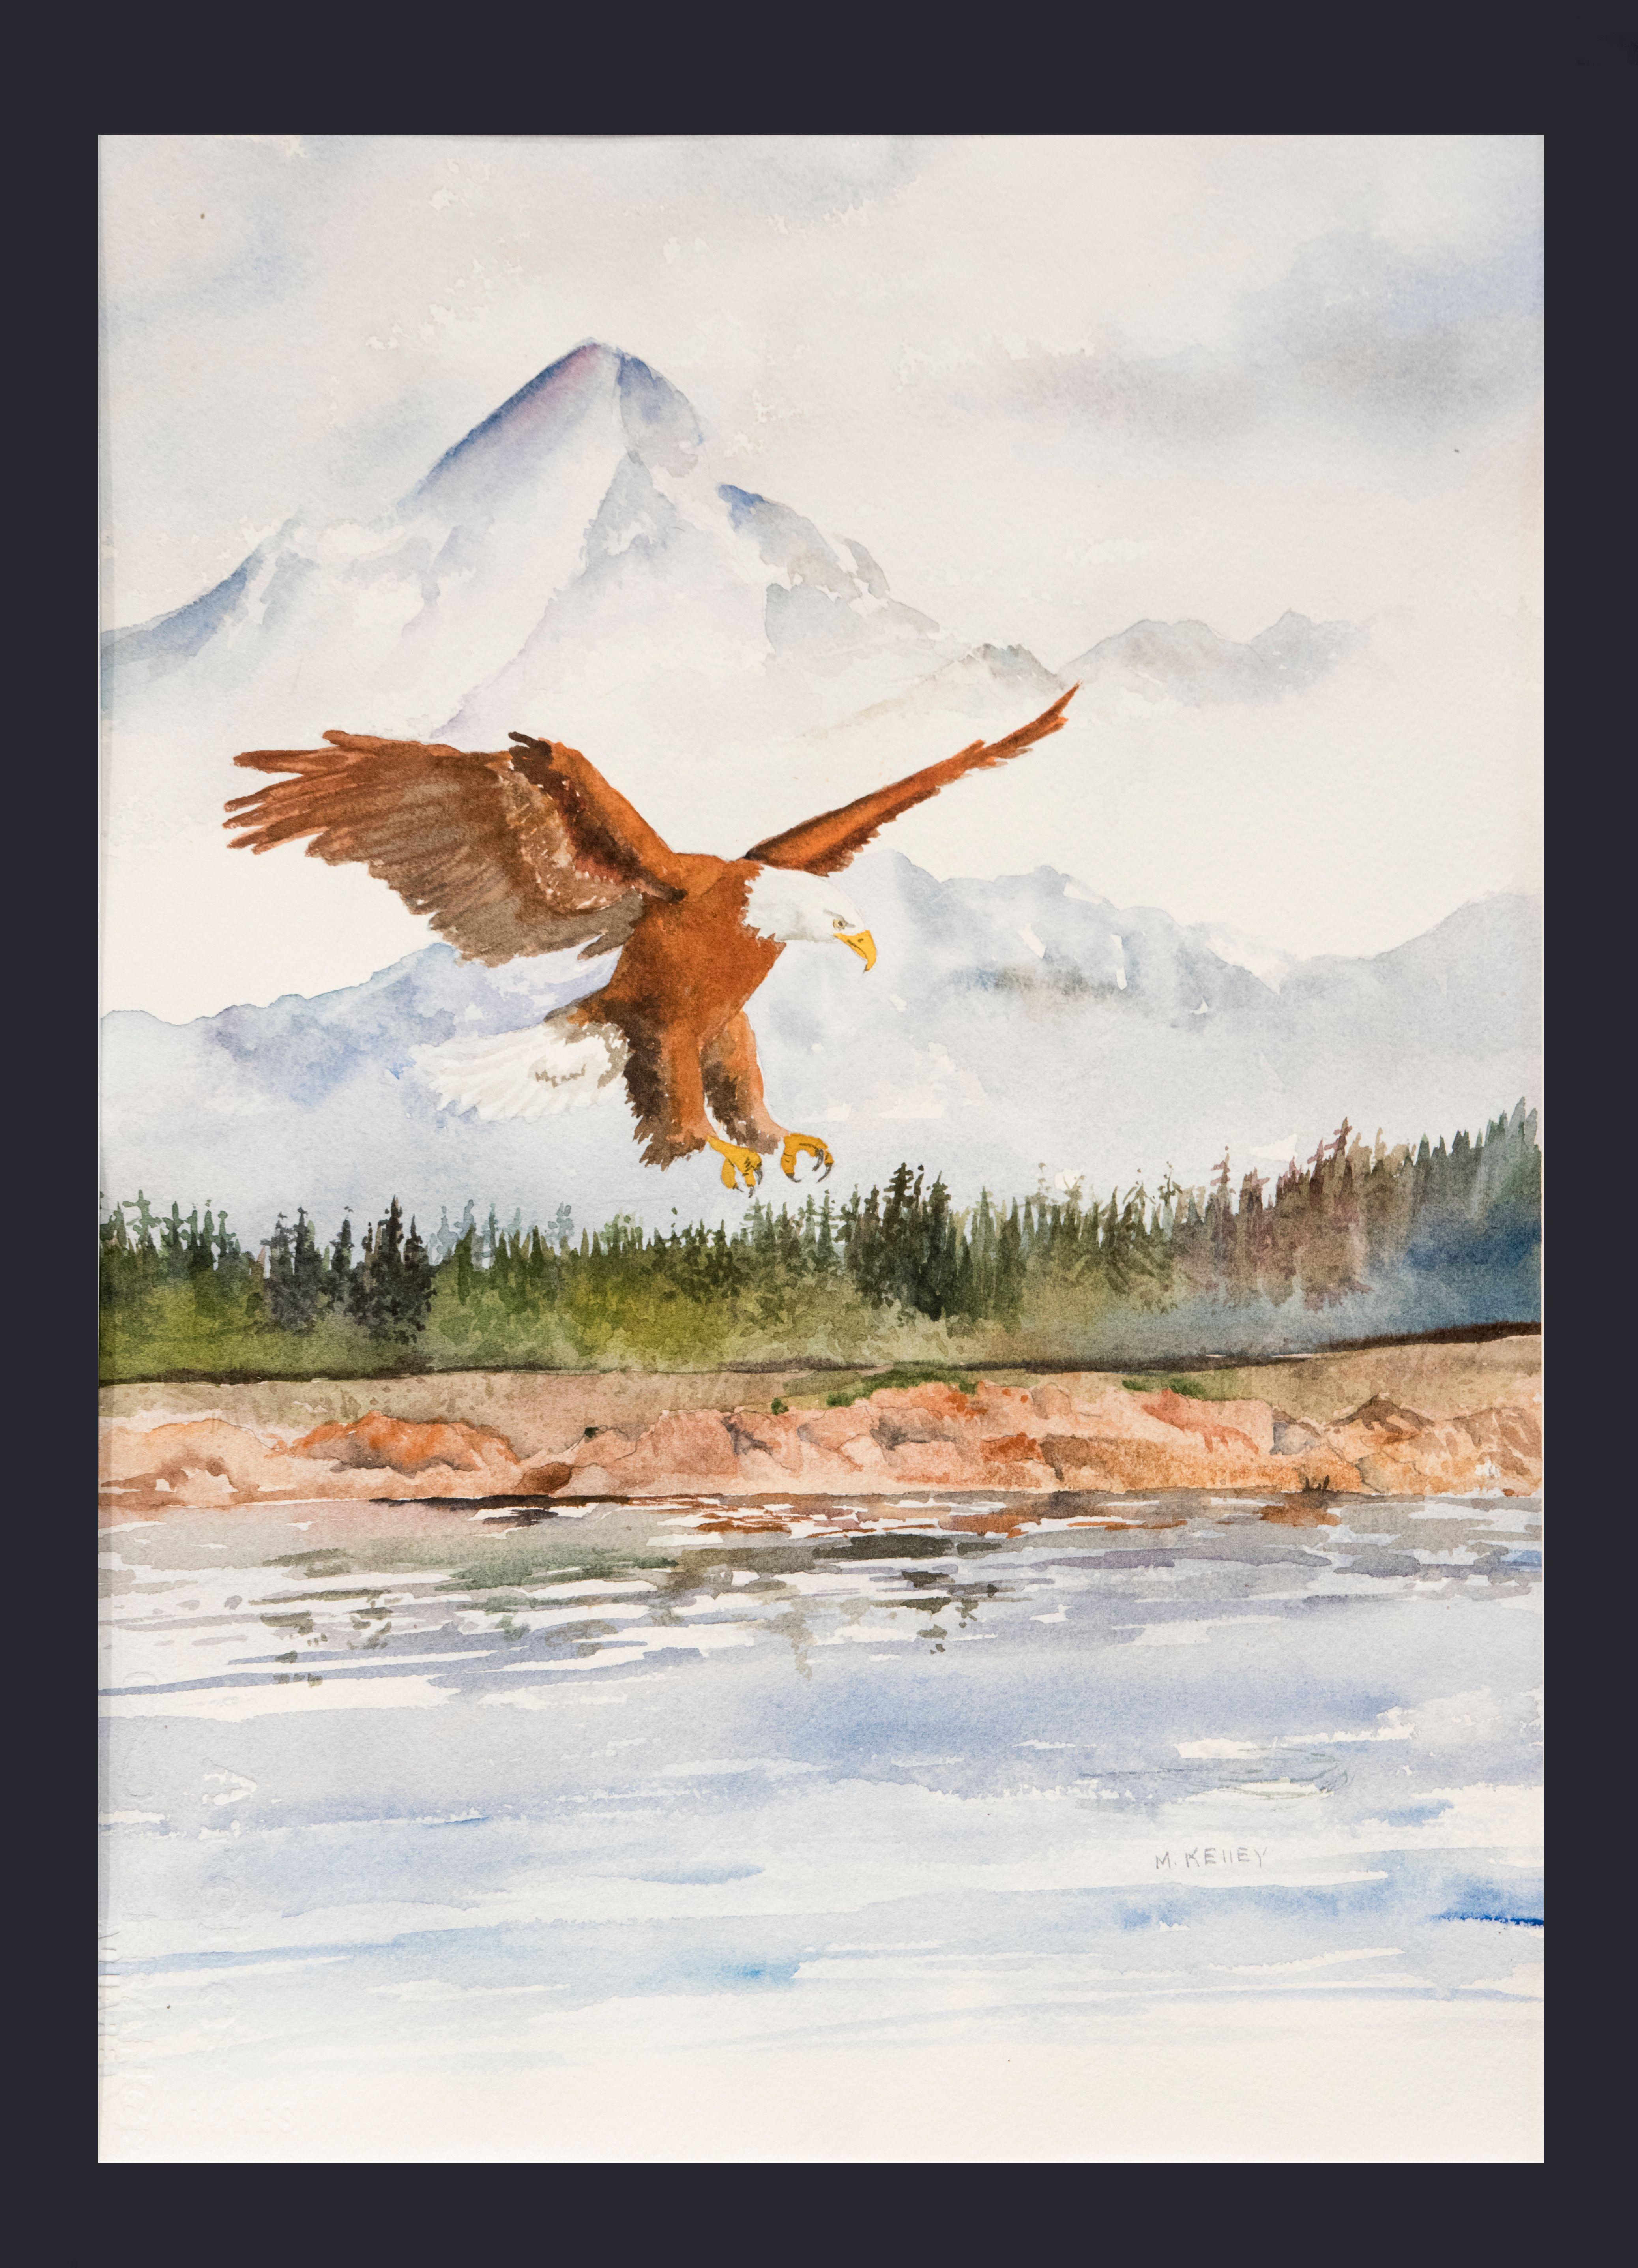 Eagle With Alaskan Splendor